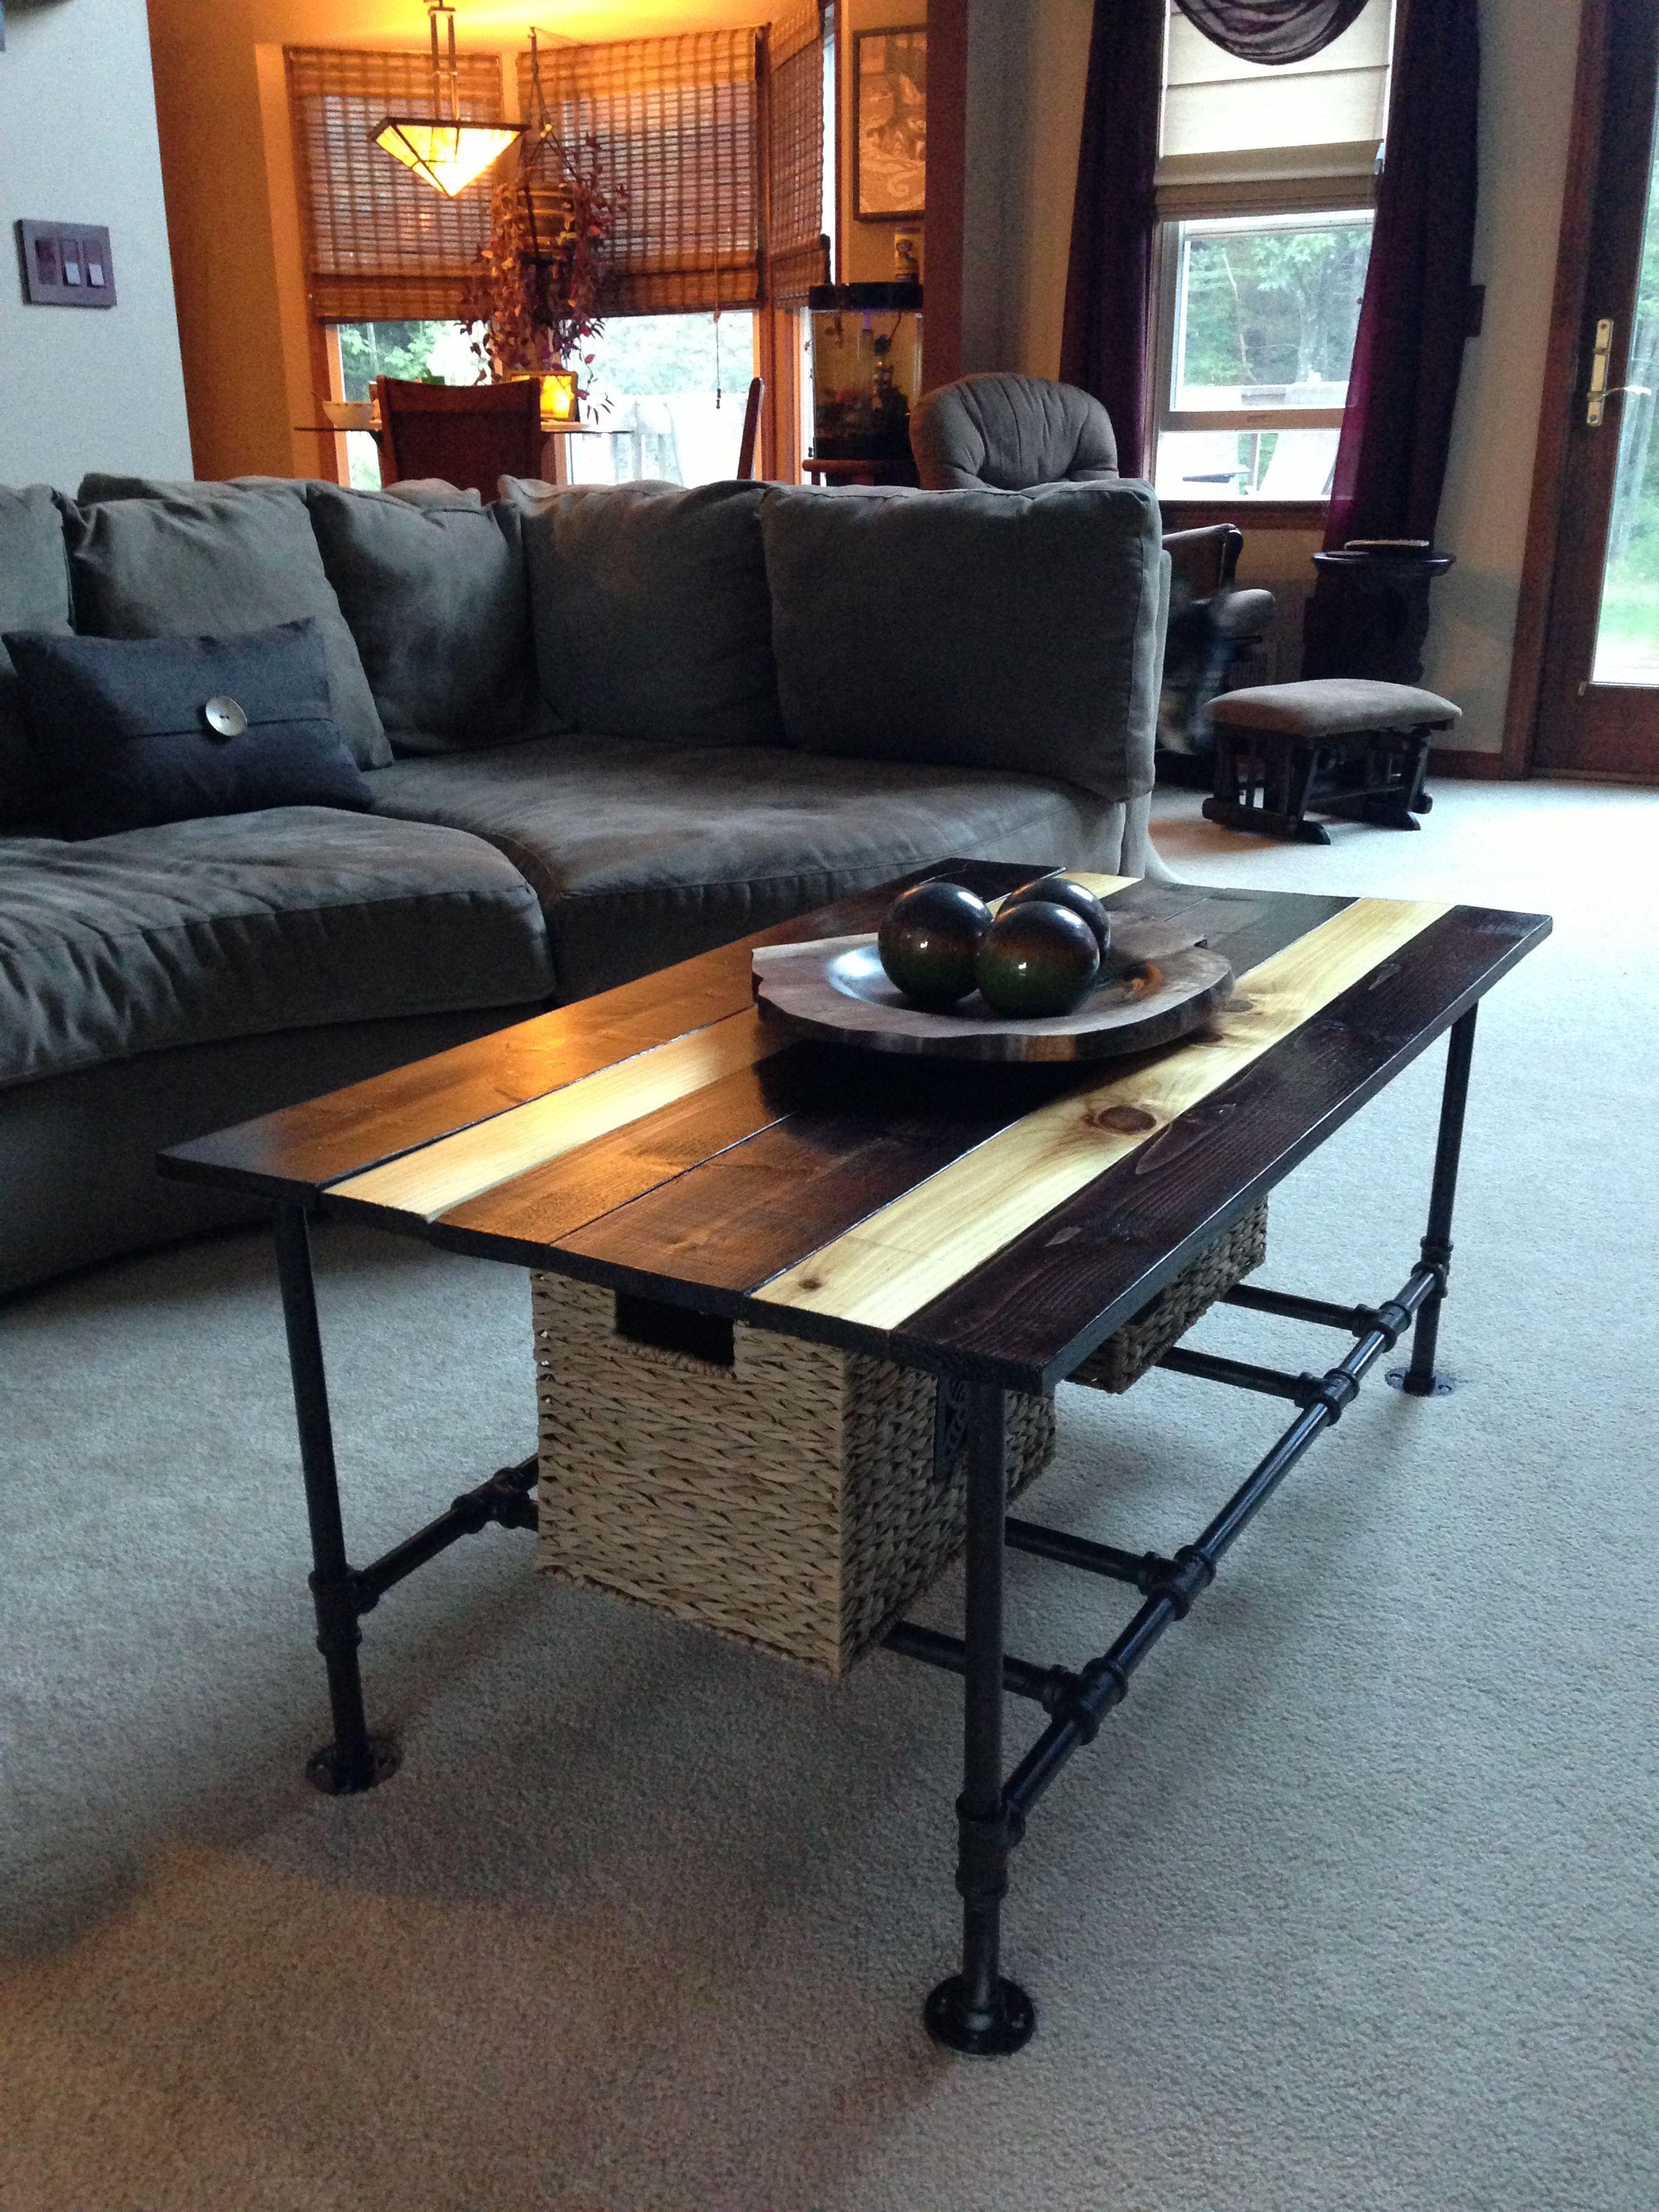 diy plumbing pipe coffee table diy m bel pinterest m bel diy m bel und wohnzimmer. Black Bedroom Furniture Sets. Home Design Ideas